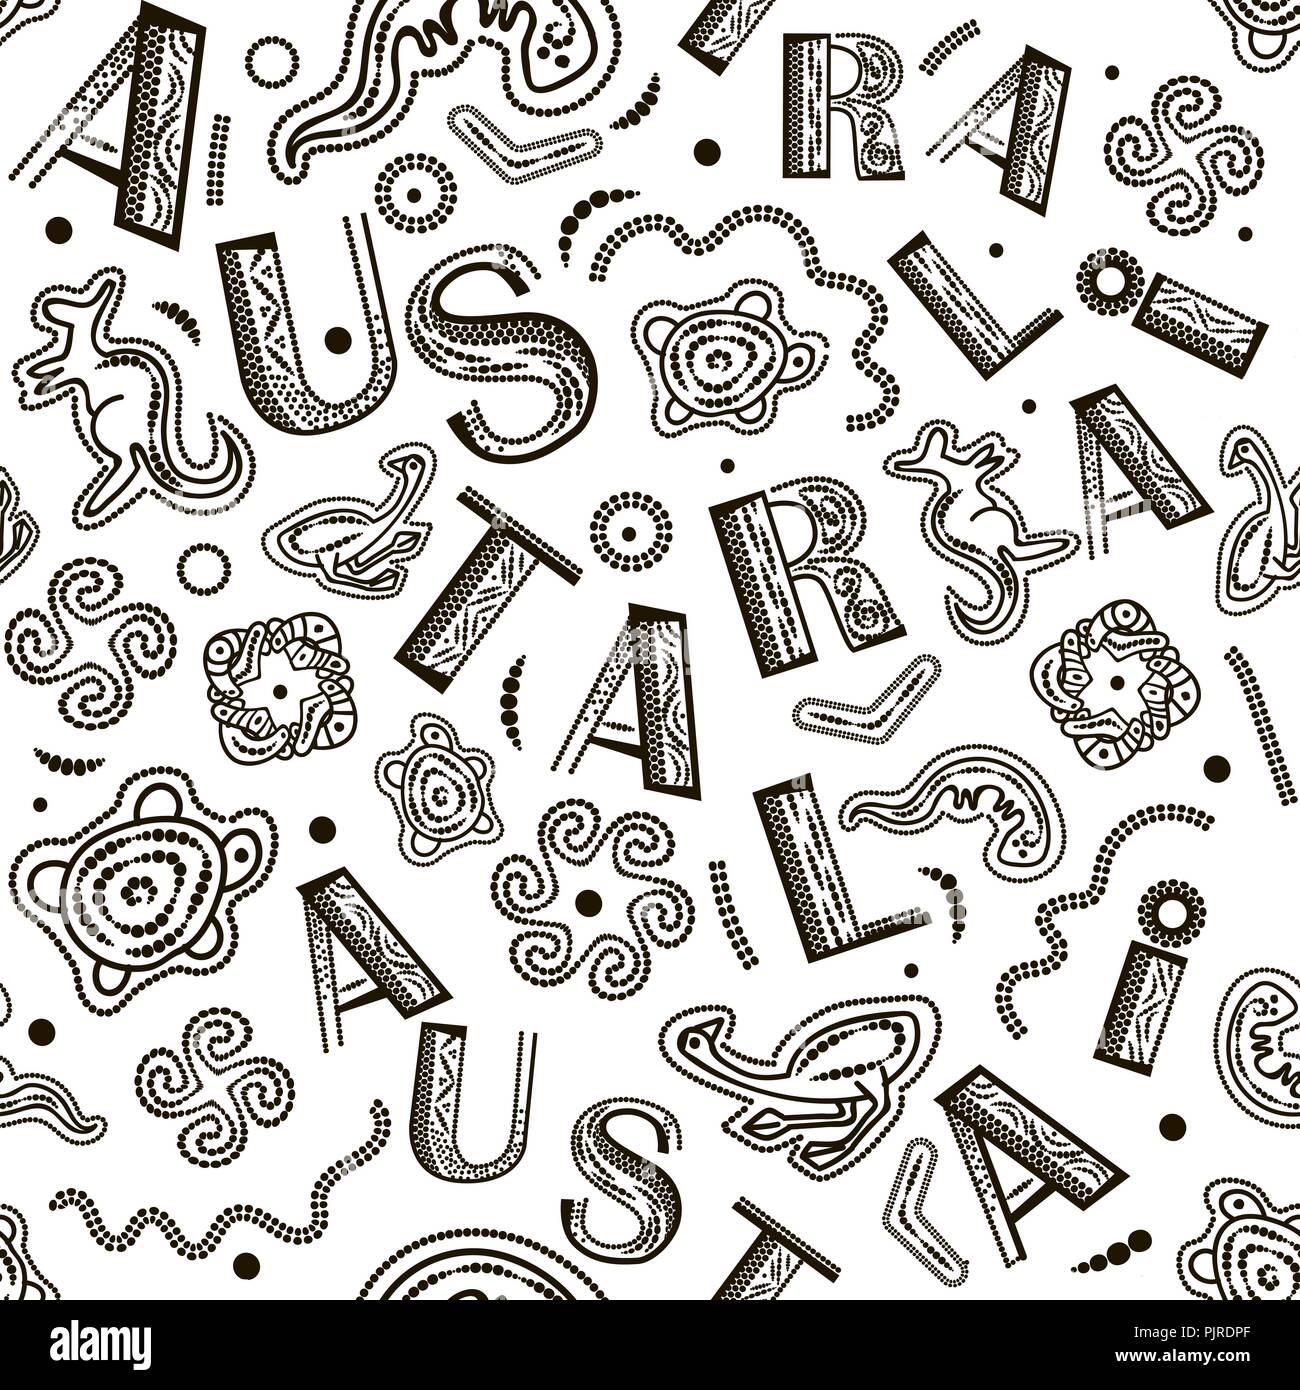 Australian Art Aboriginal Mosaic Stock Photos Amp Australian